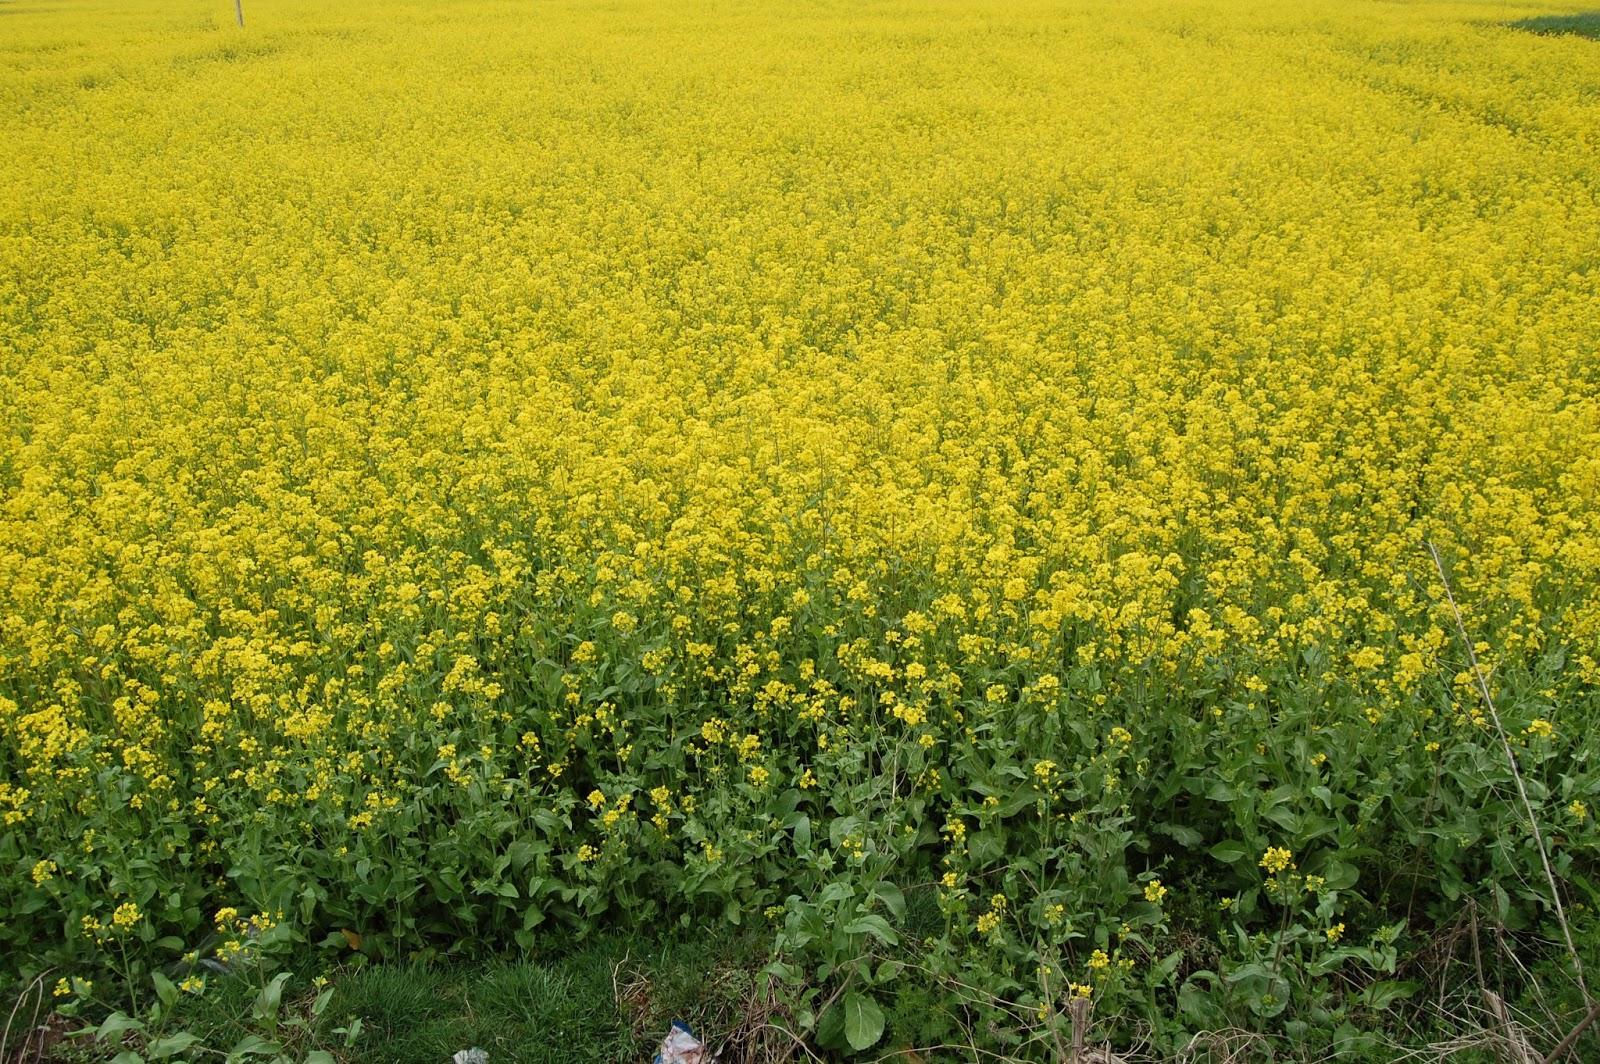 Chinar shade mustard flowers bloom in spring season of kashmir mustard flowers bloom in spring season of kashmir kashmir spring time mightylinksfo